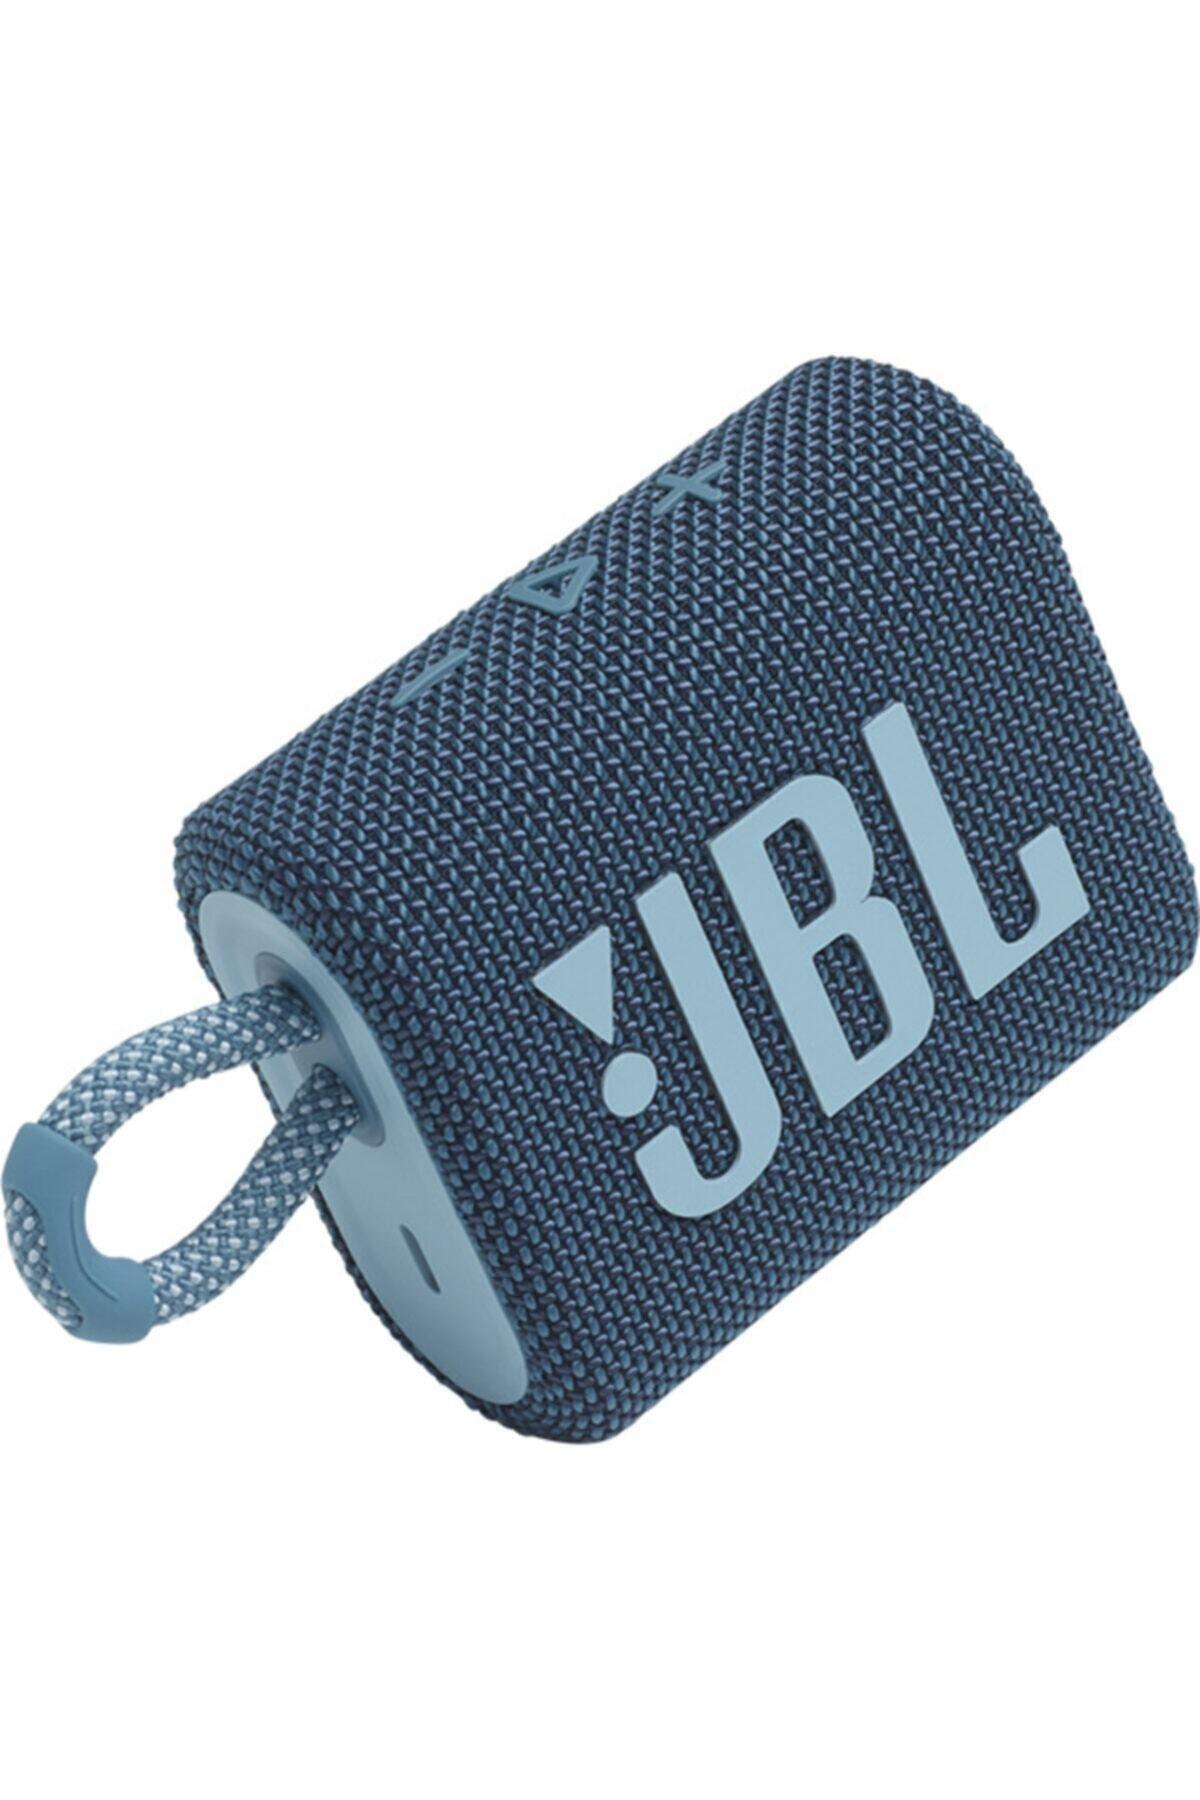 JBL Go 3 Mavi Bluetooth Hoparlör 1